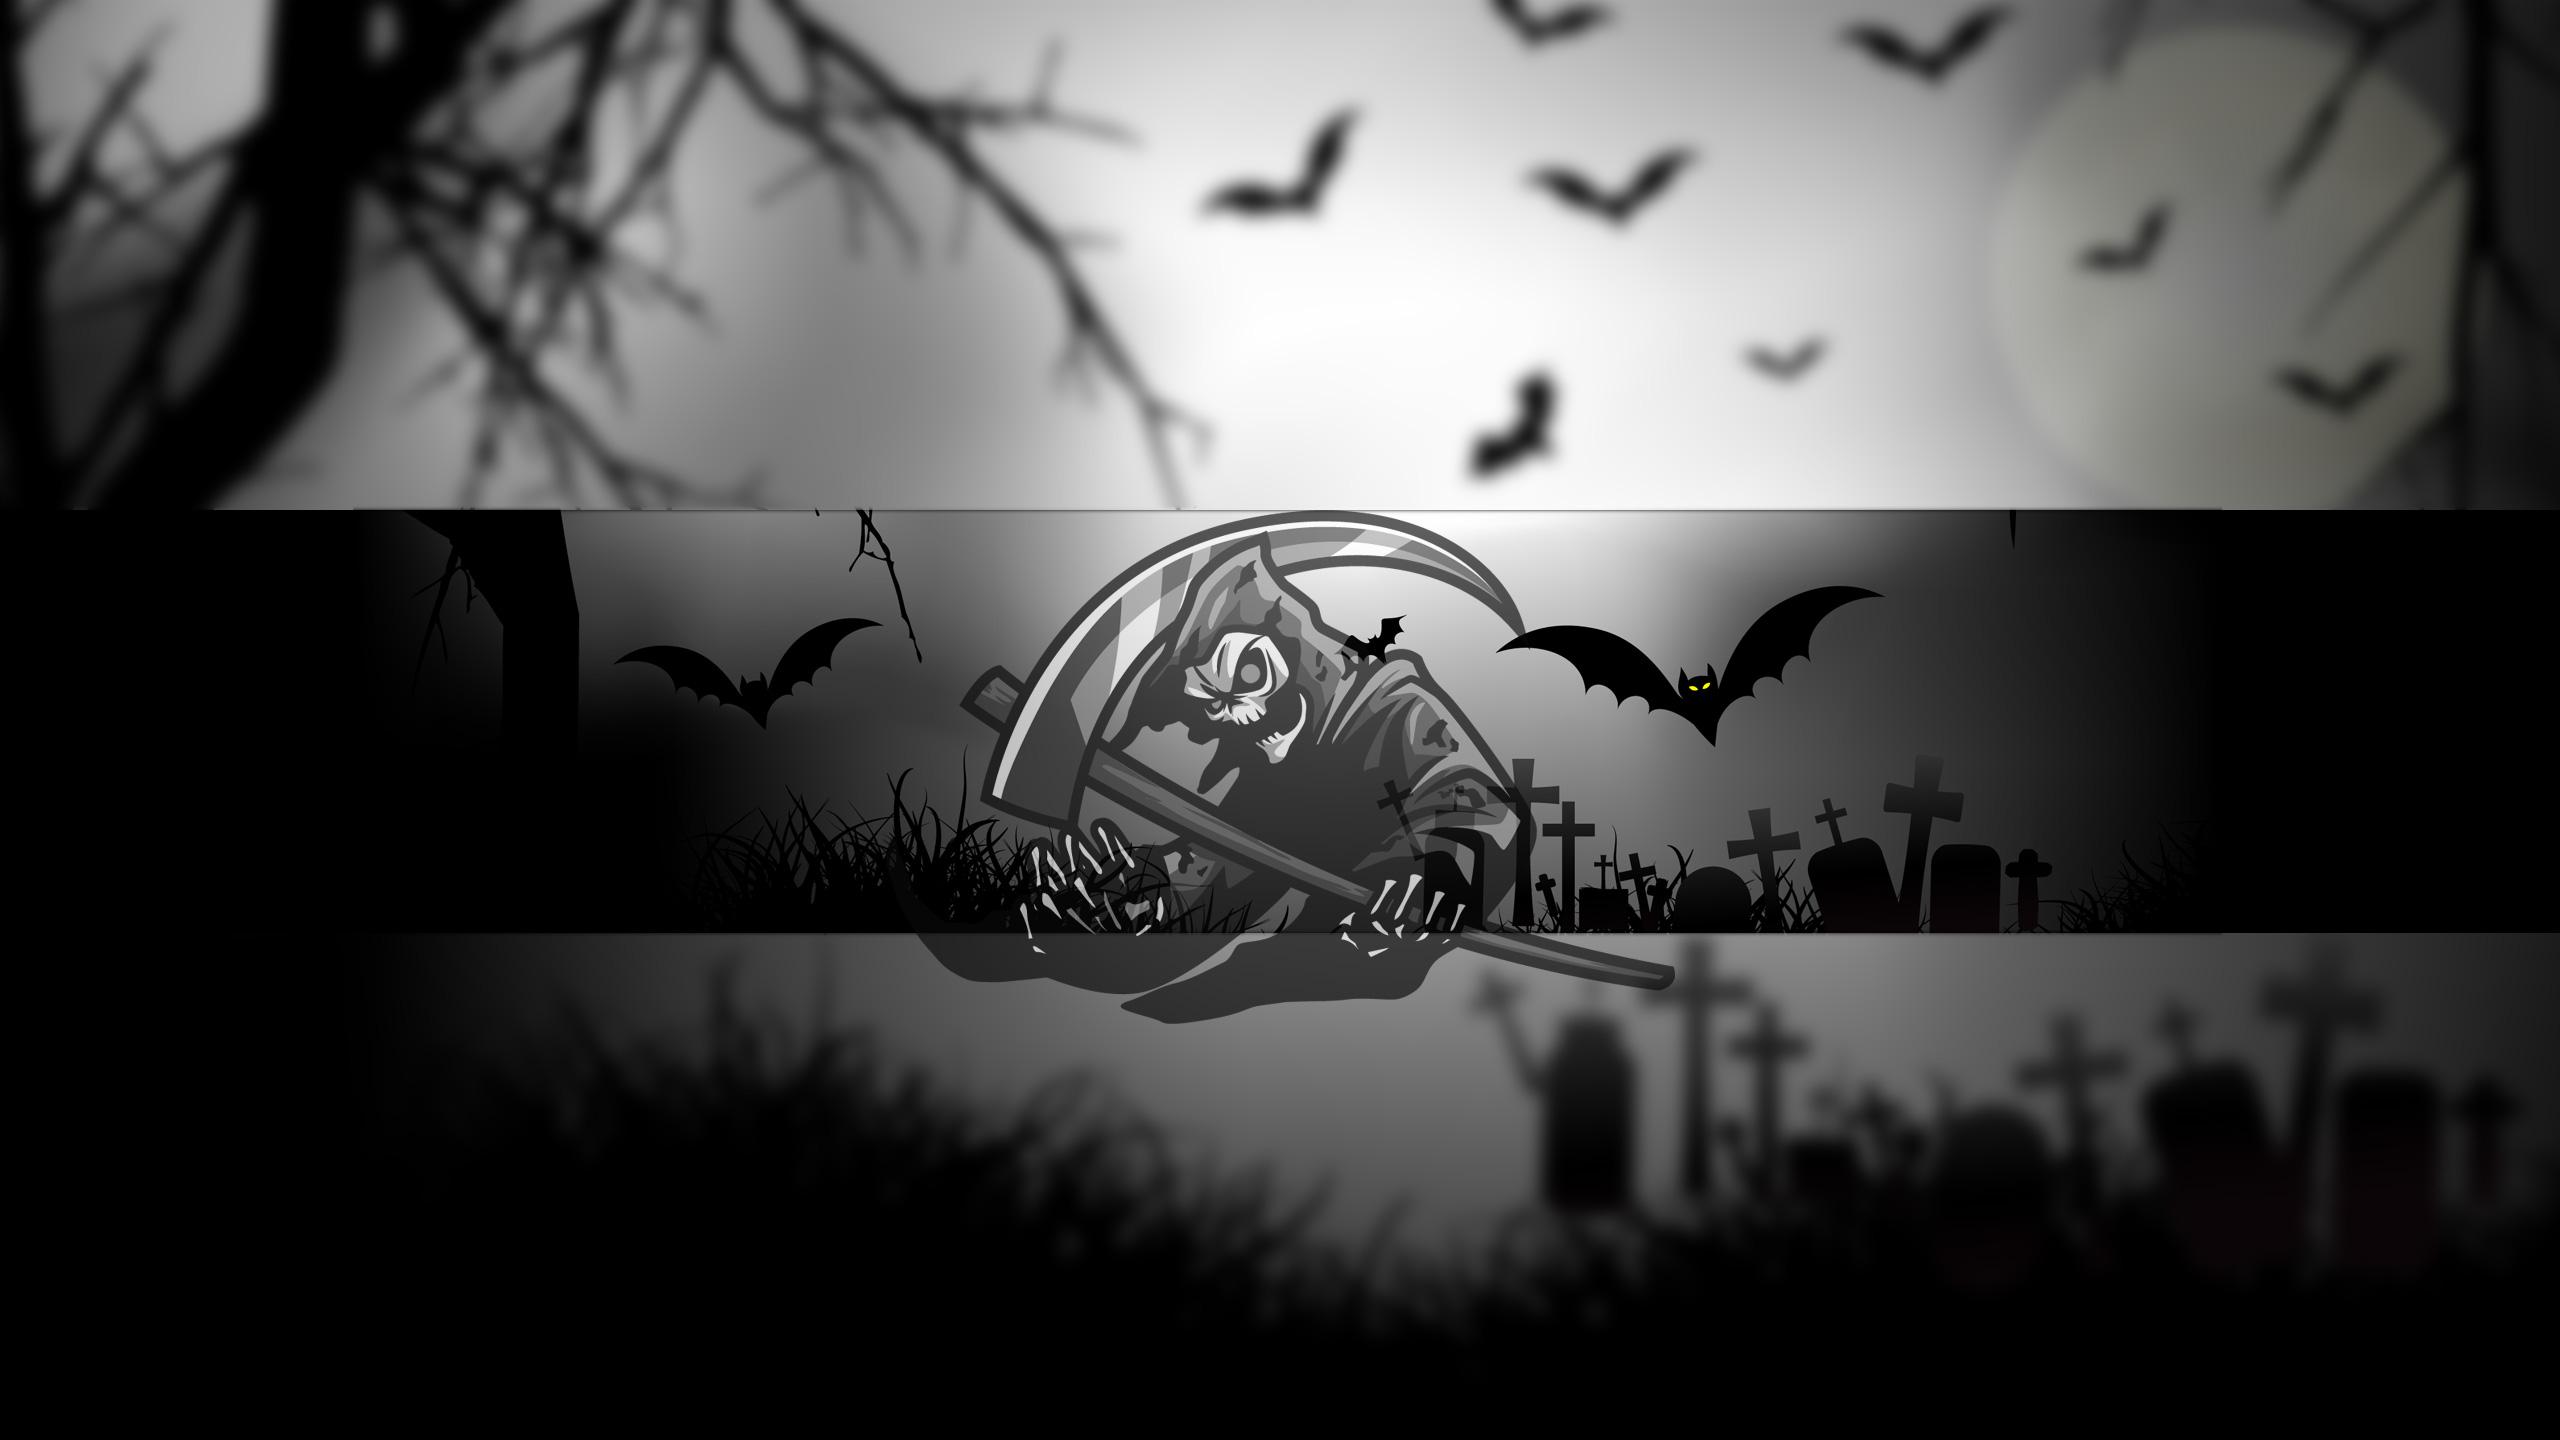 Чёрно - белая картинка хэллоуин для шапки ютуба со скелетом.